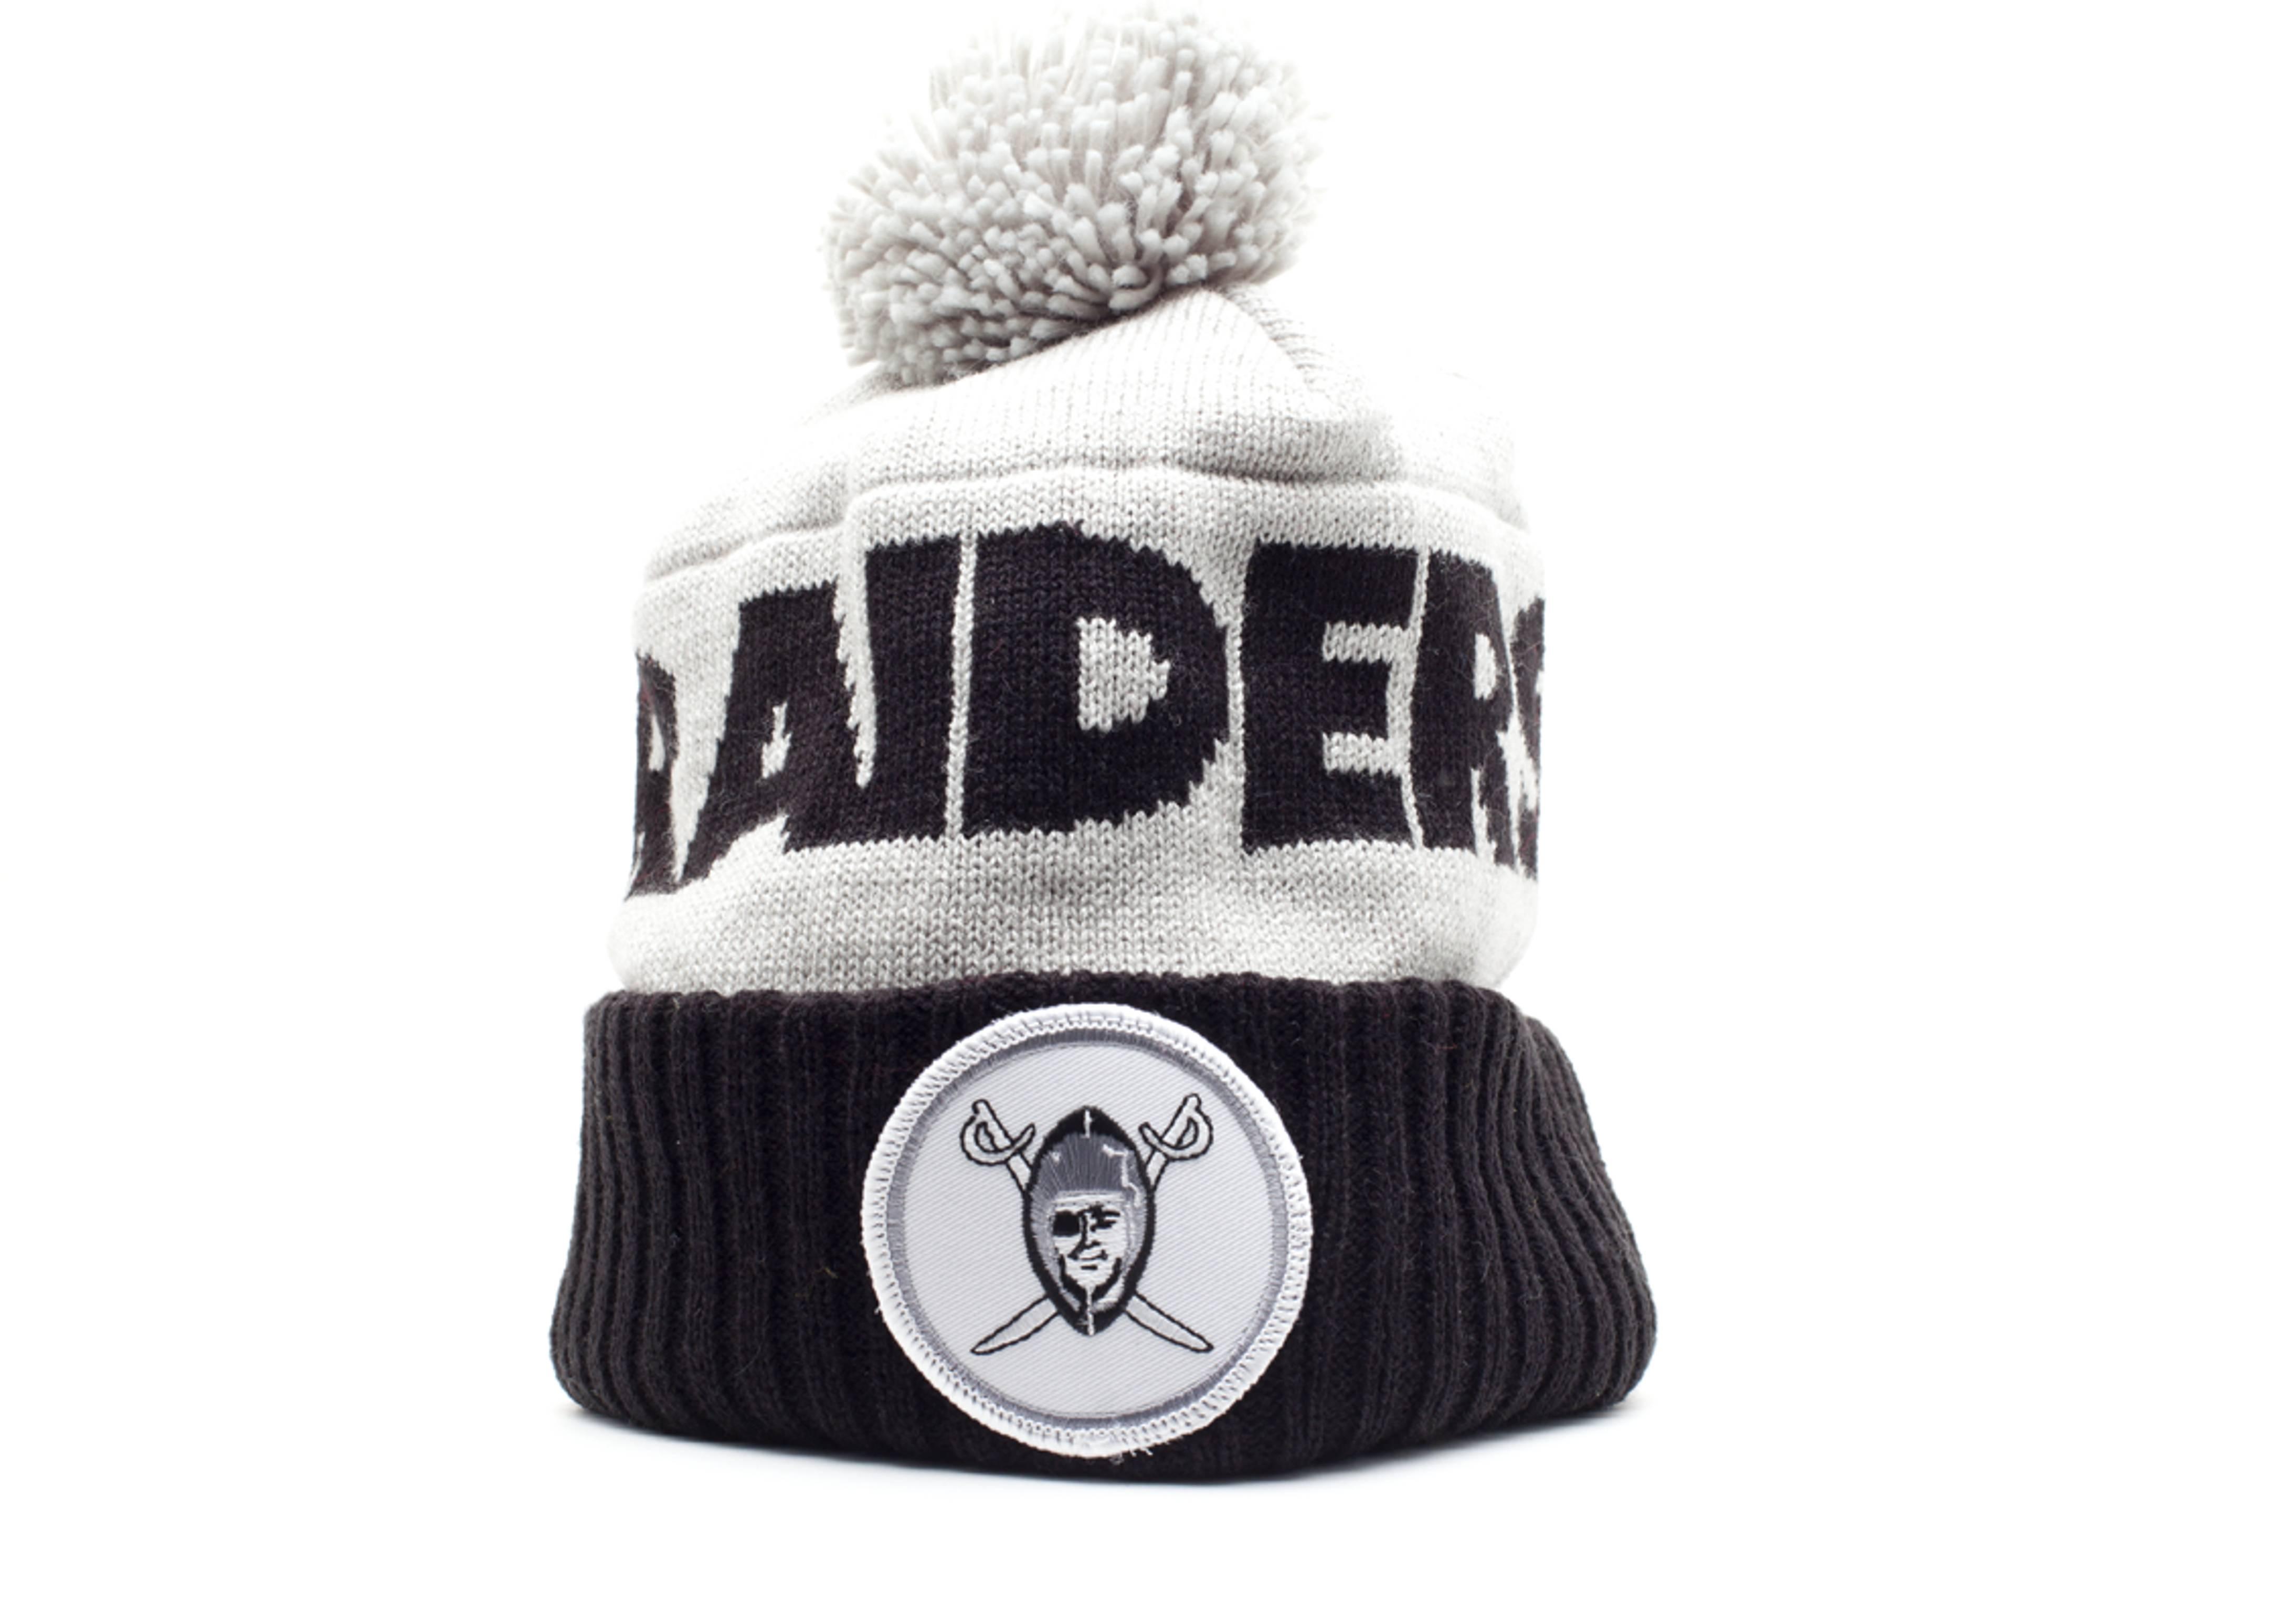 cfb42600898 Oakland Raiders Cuffed Pom Knit Beanie - Mitchell   Ness - ke30mtc6raide -  gray black